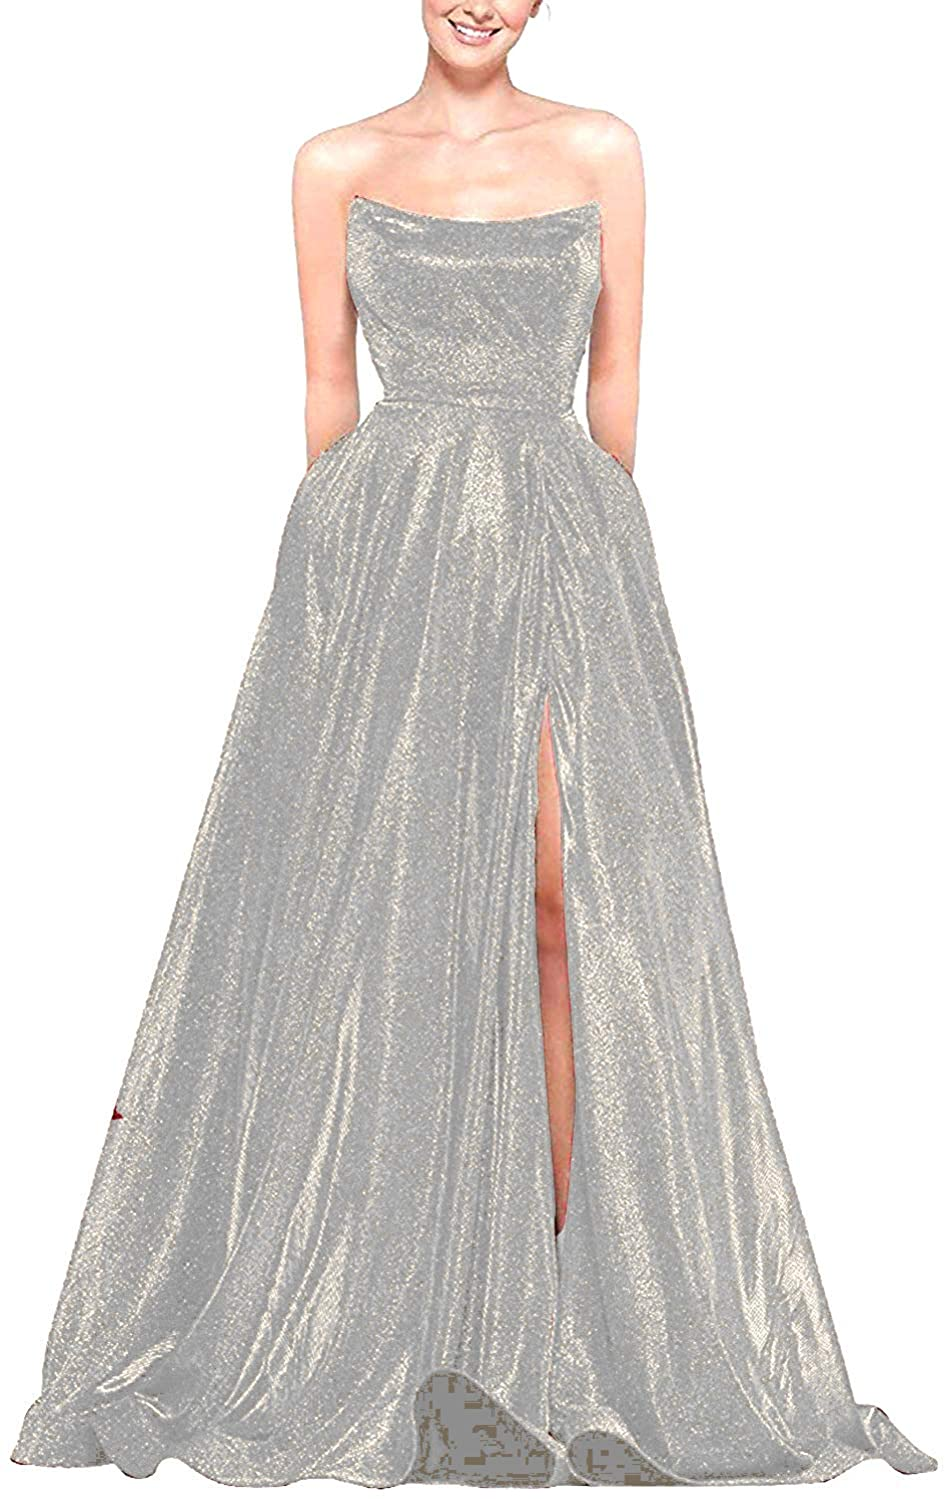 P PROMSTAR Strapless Prom Dresses Long Glitter Slit Ball Gowns Formal Dress for Women with Pockets